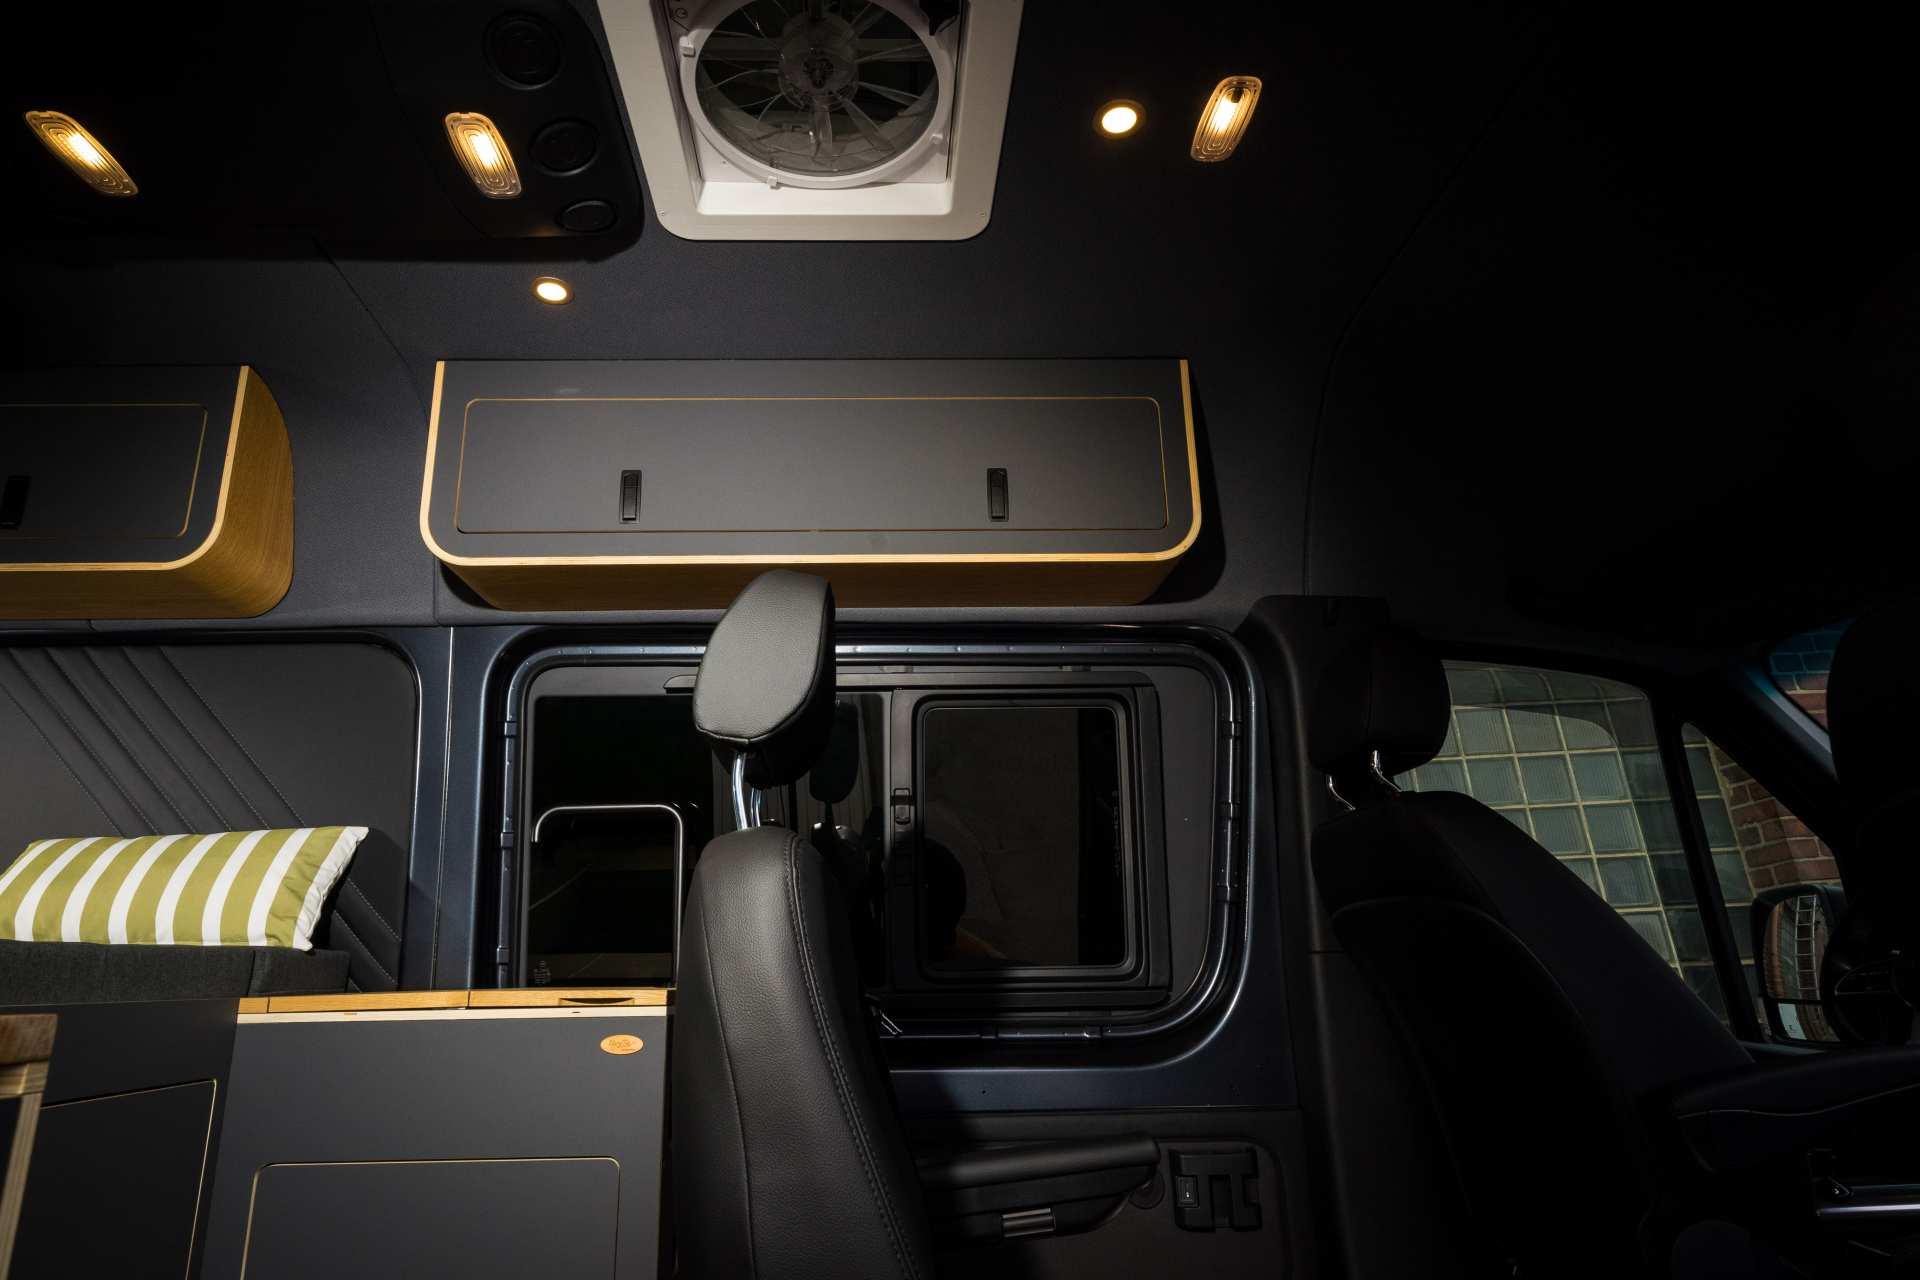 Individualausbau: Mercedes L2 H2 Mixto - 4